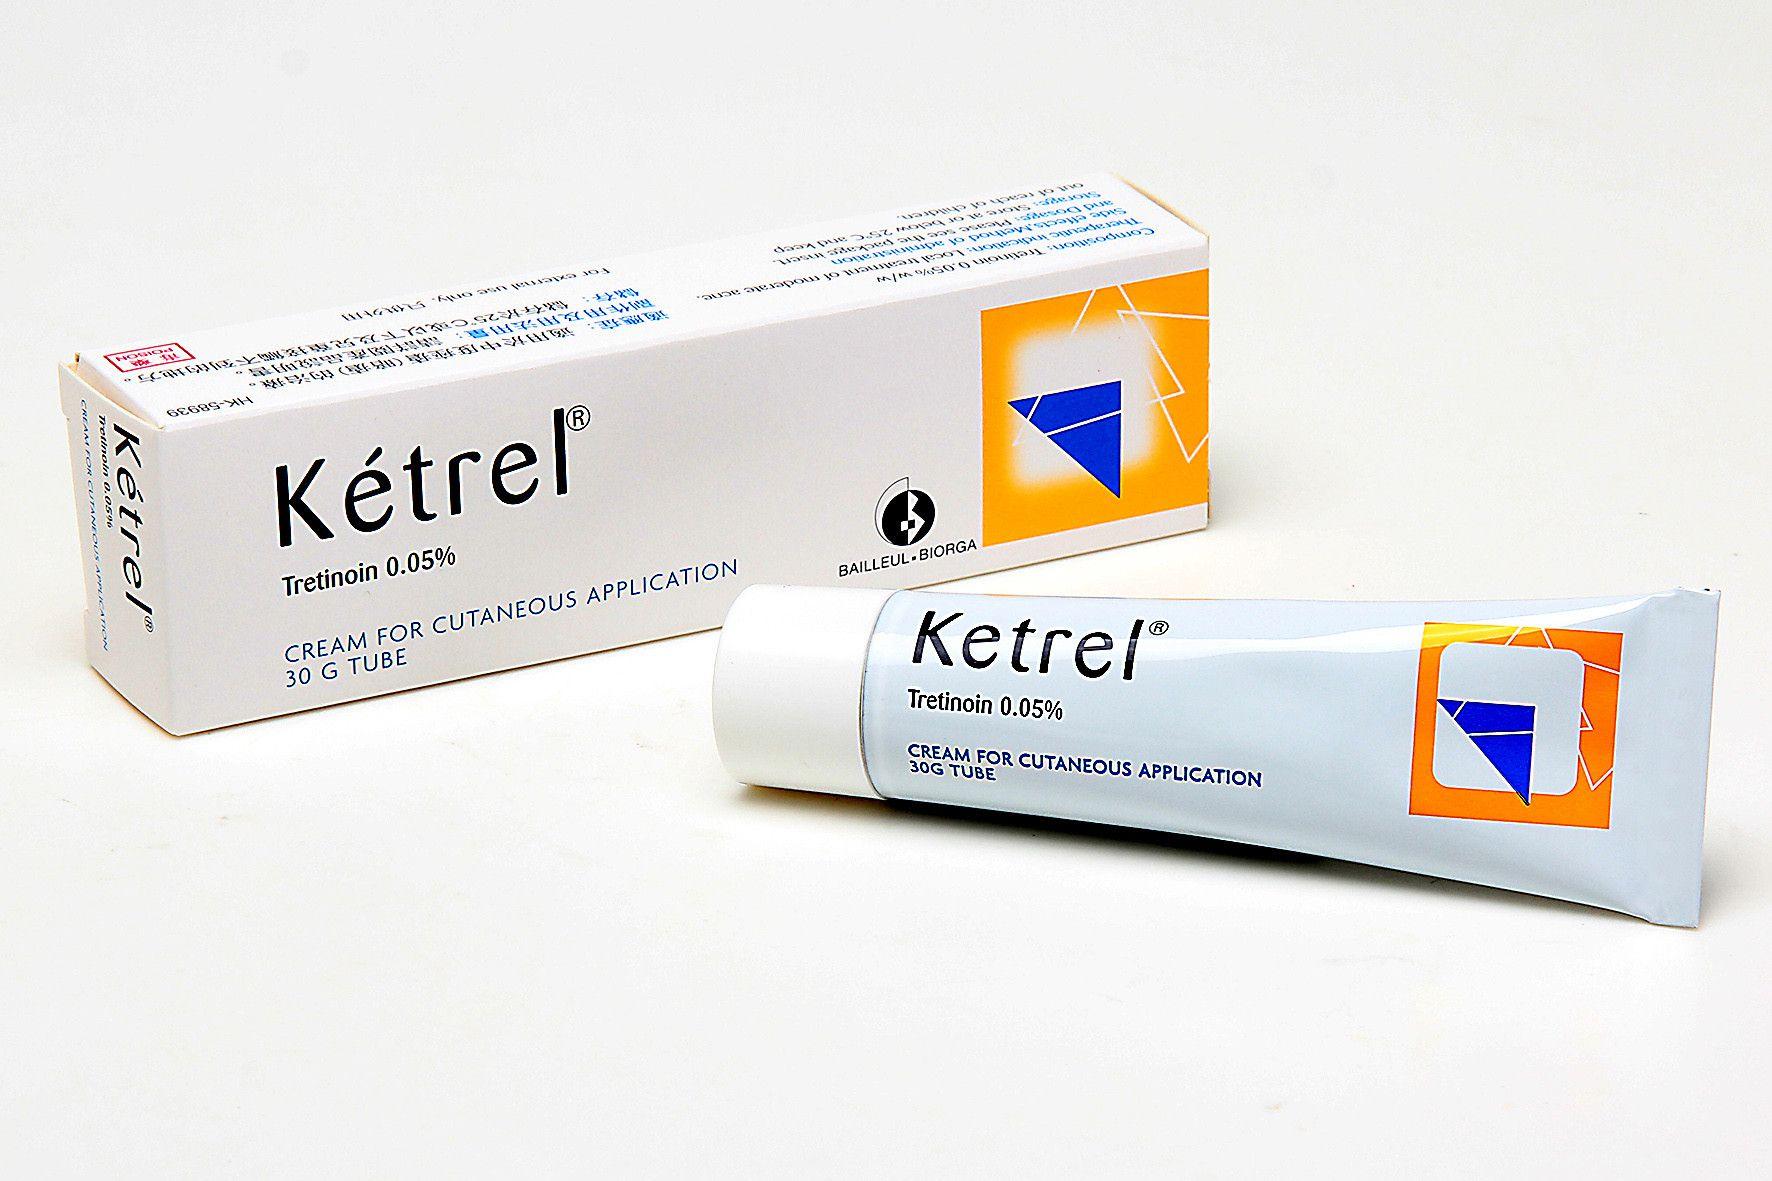 Image Result For Ketrel Tretinoin 0 05 Cream For Cutaneous Application Ketrel 0 05 Tretinoin Tretinoin Cream Skin Care